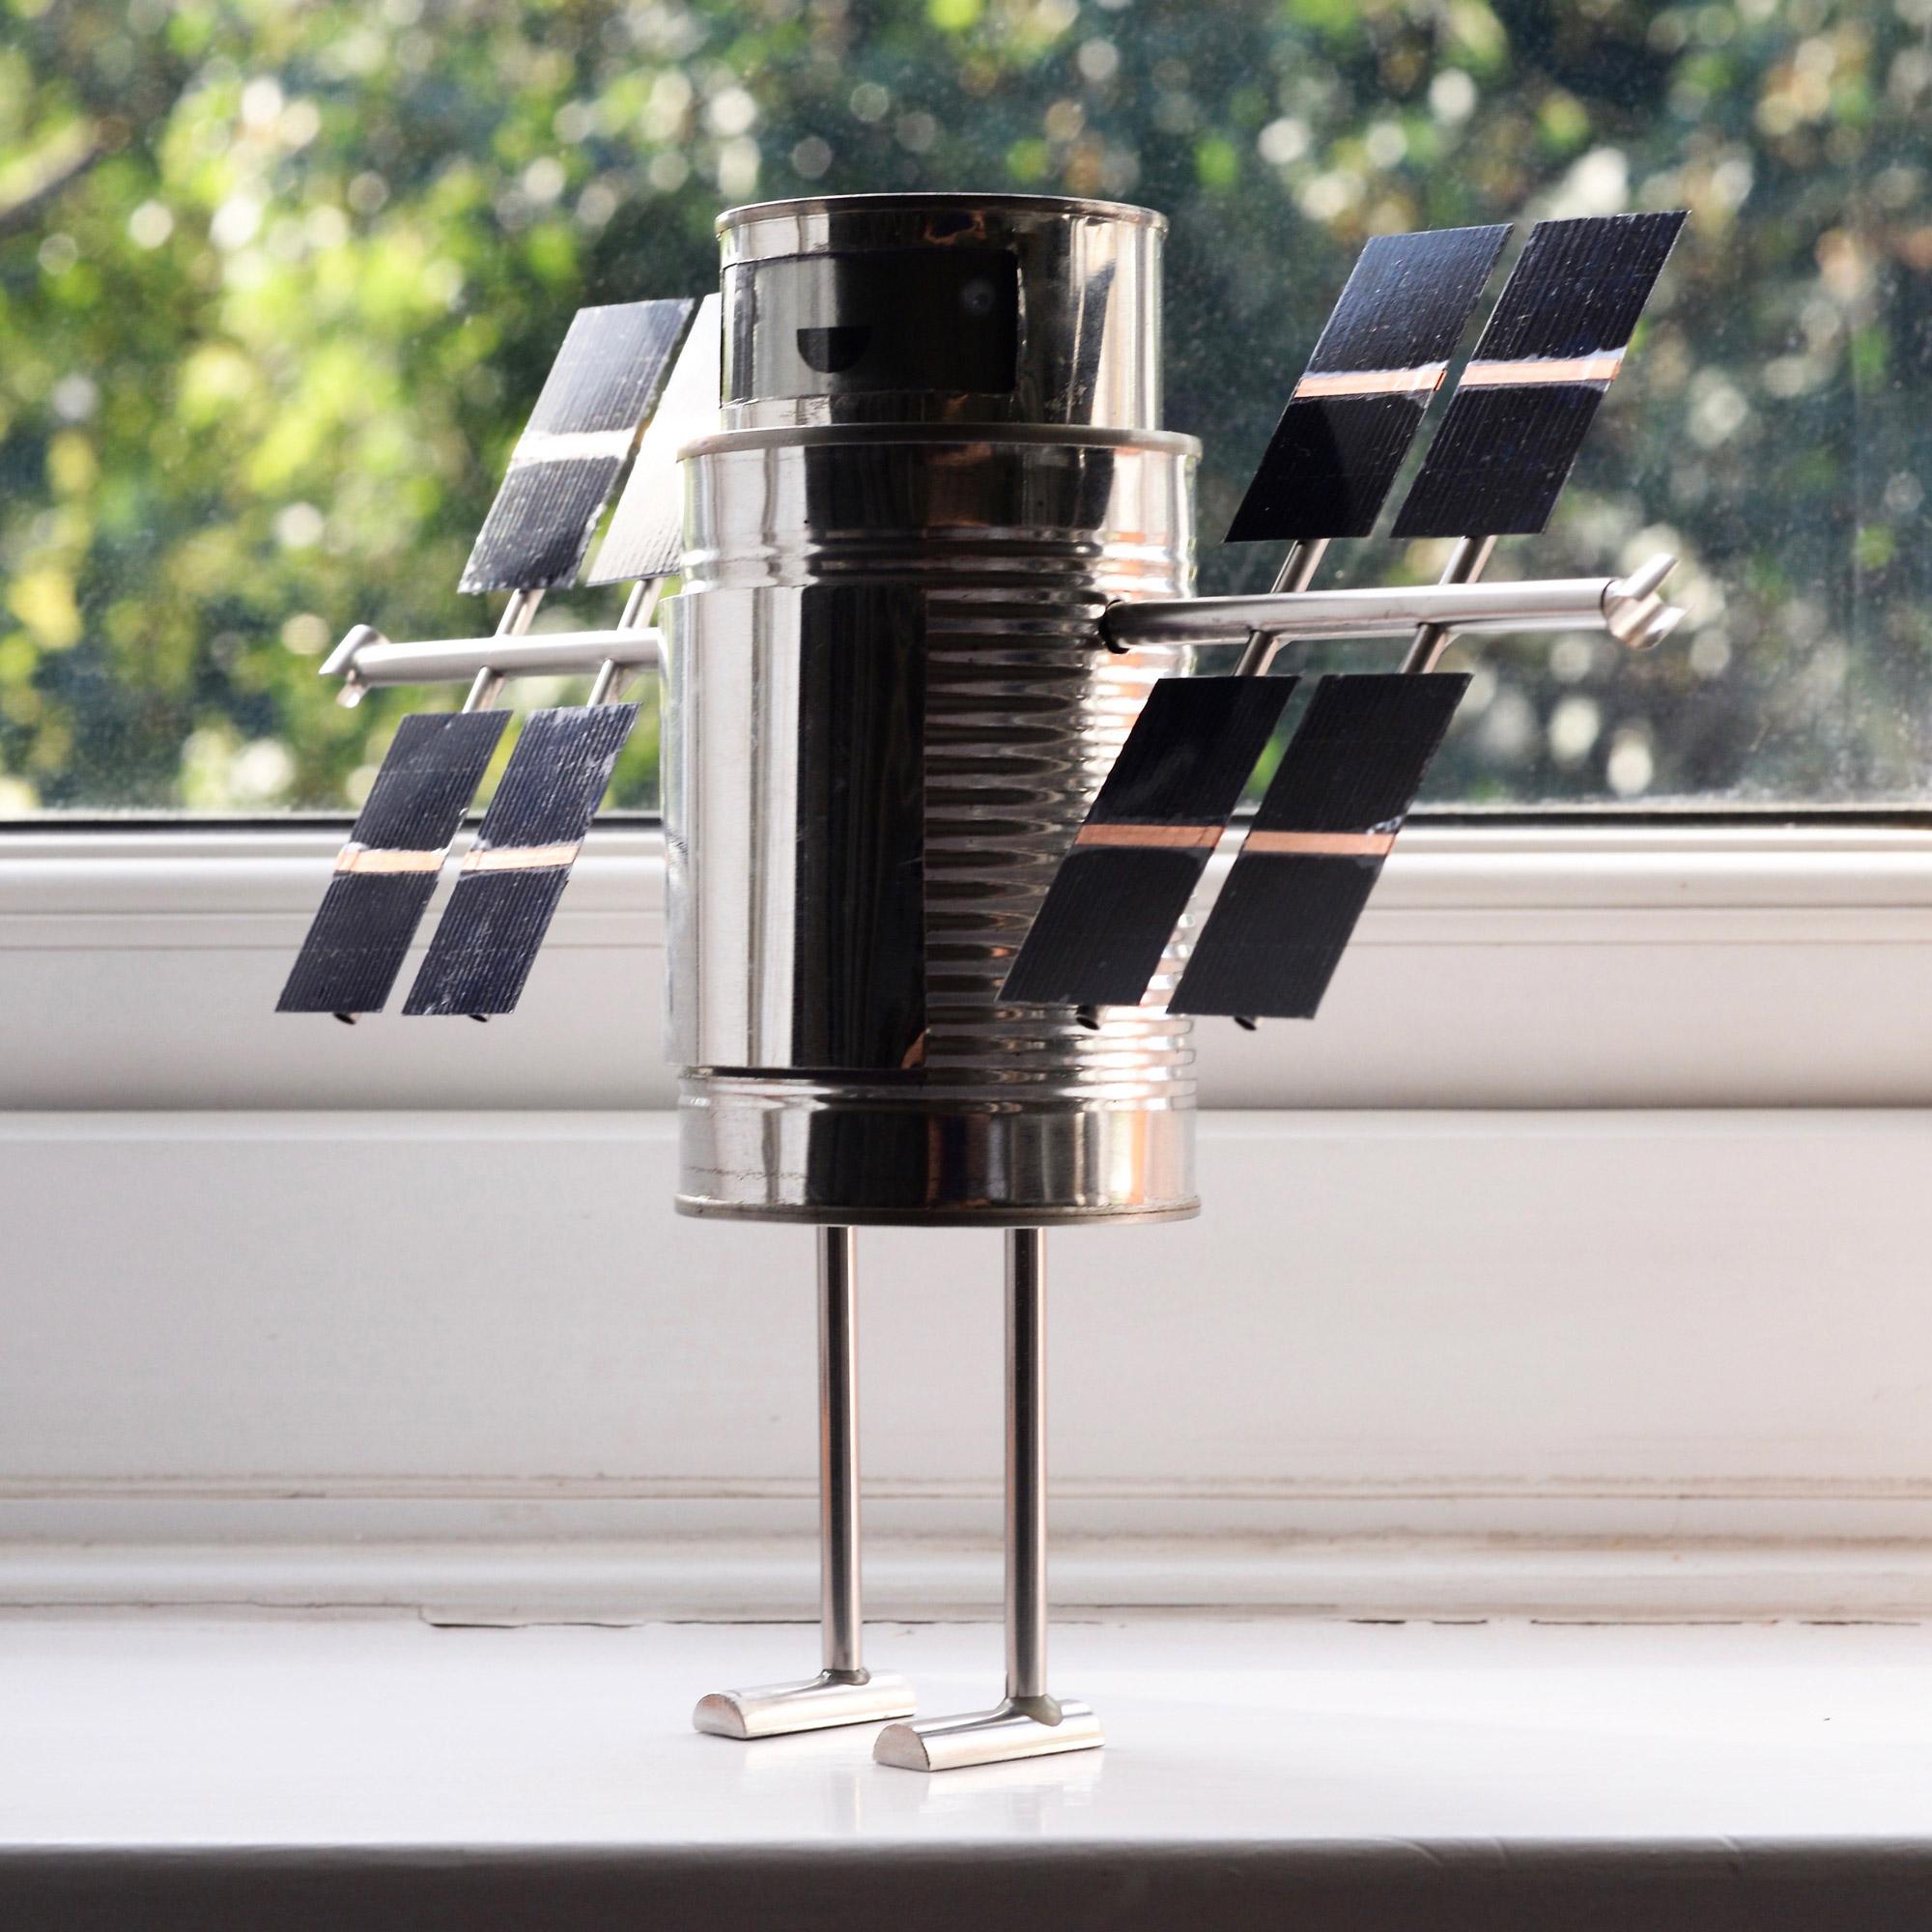 My solar robot, sitting on the windowsill, harvesting sunlite